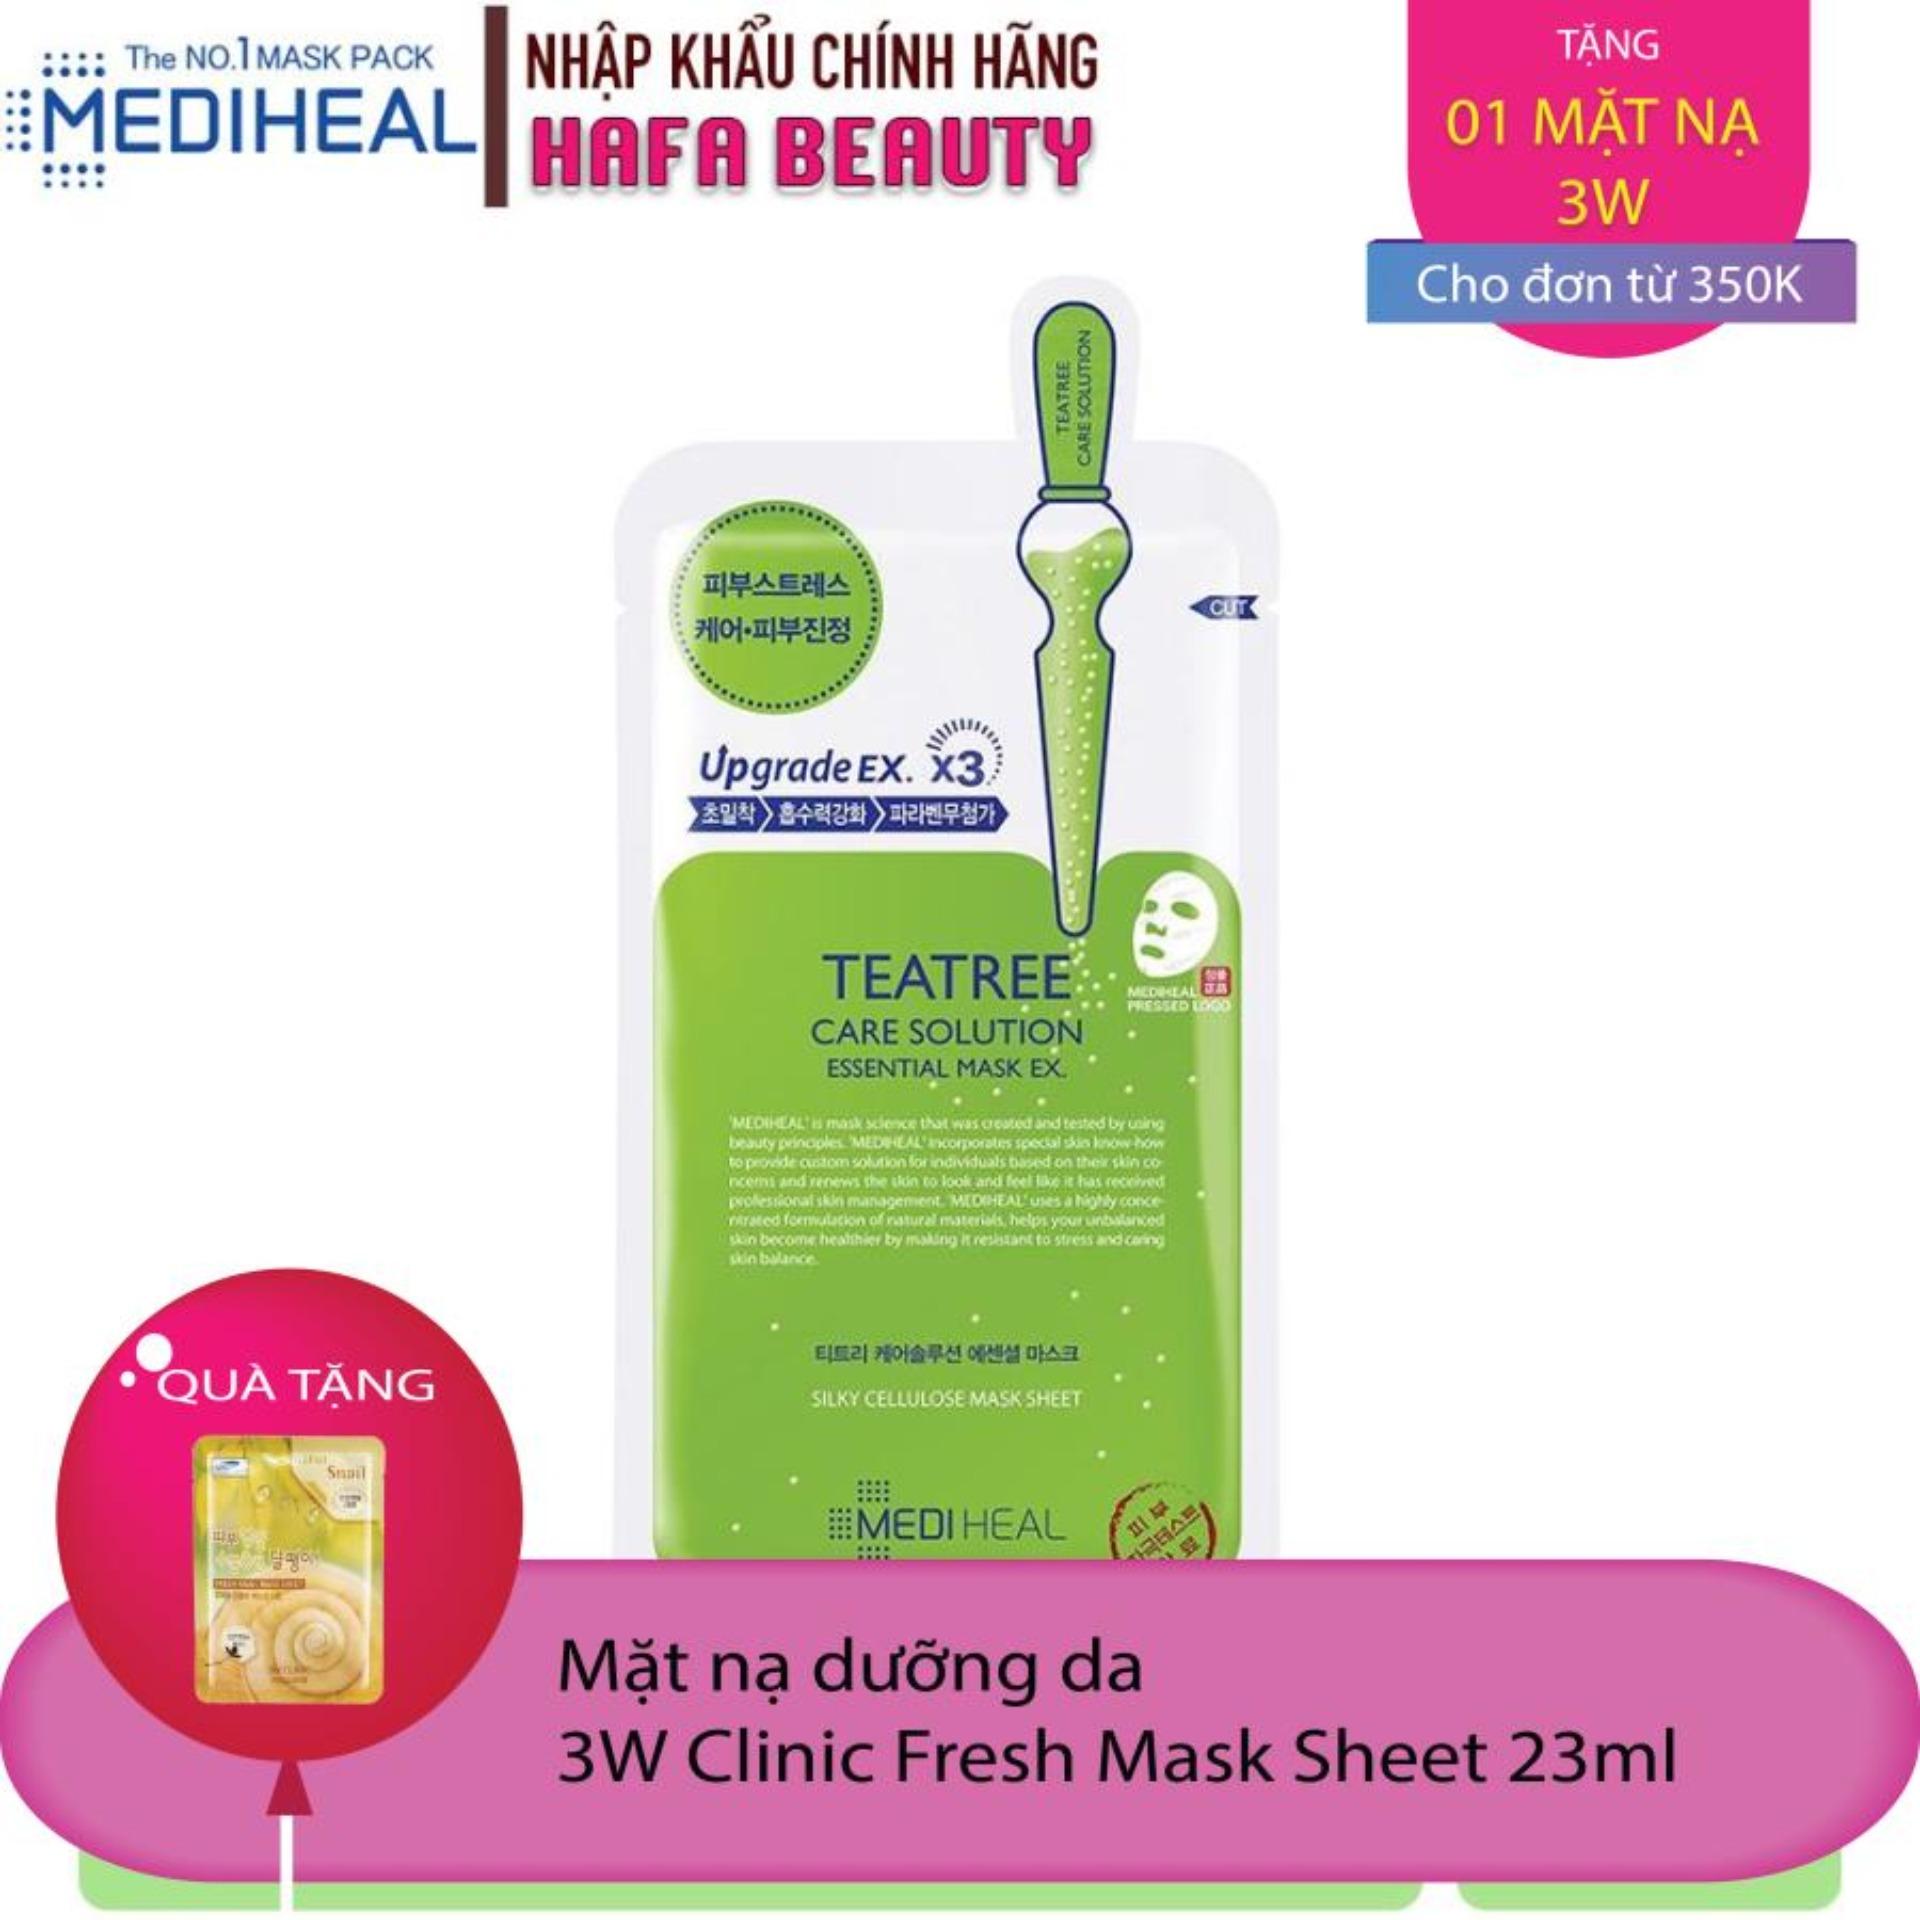 Mặt nạ dưỡng da trị mụn chiết xuất Tràm trà Mediheal Teatree Care Solution Essential Mask Ex 24ml